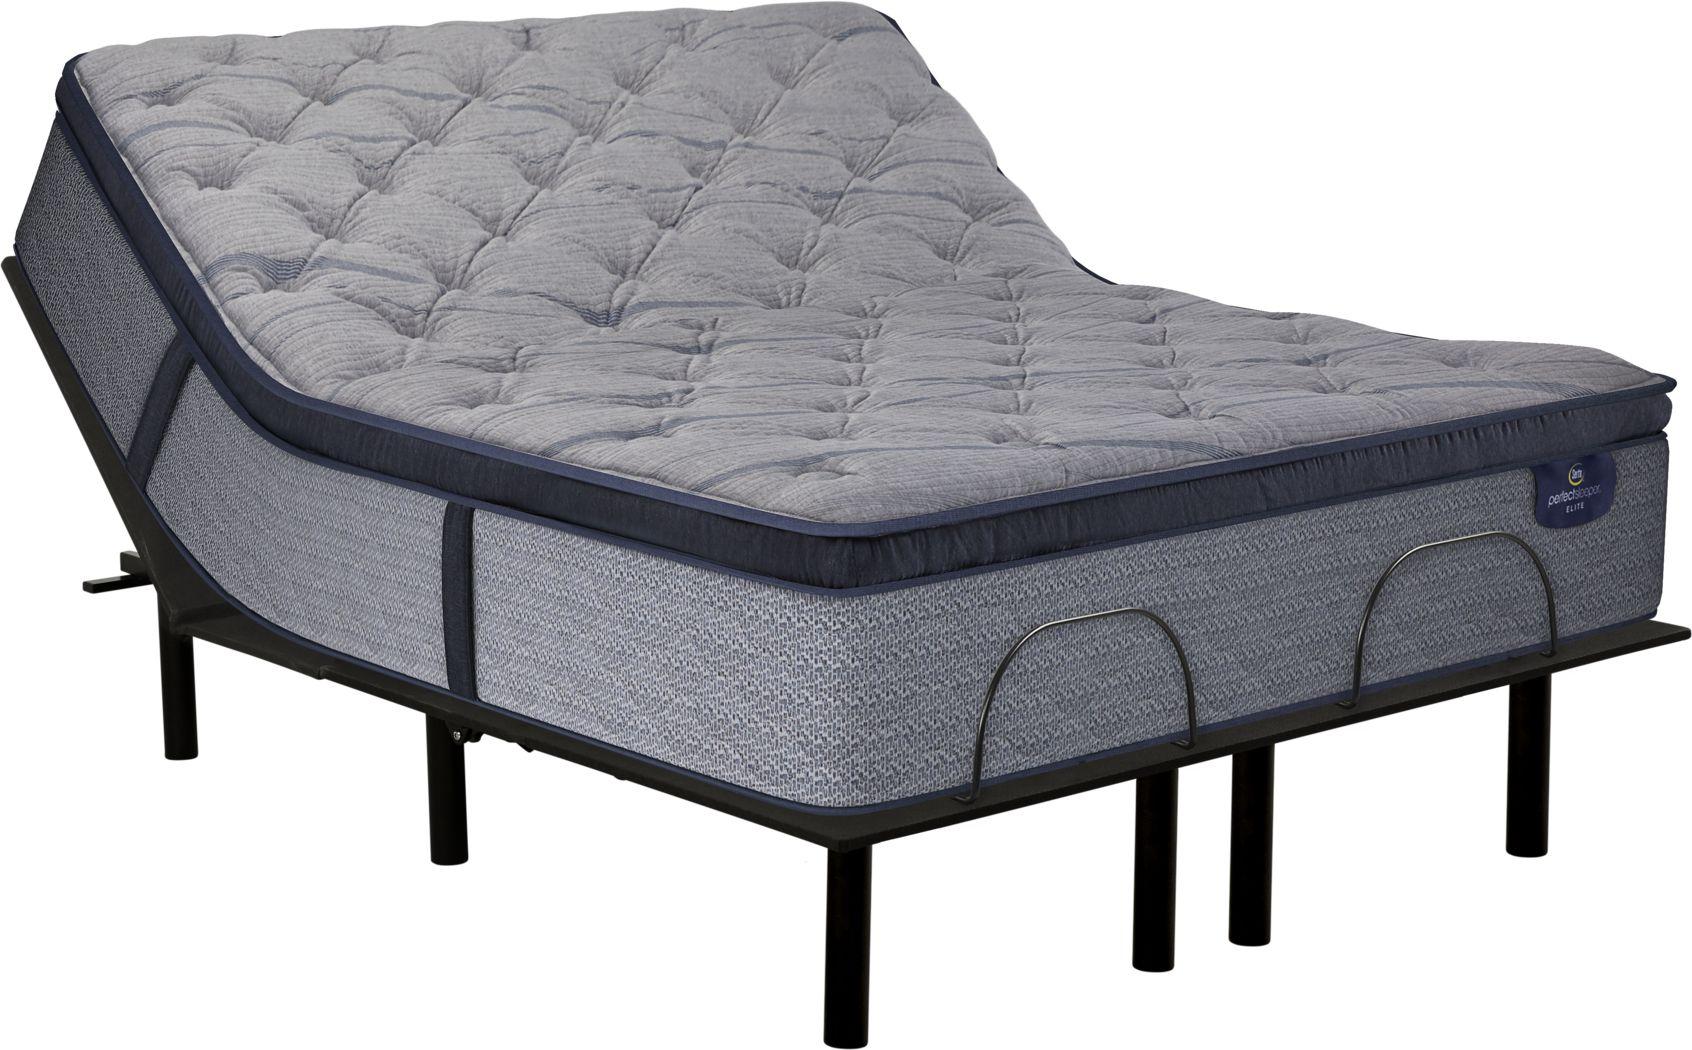 Serta Perfect Sleeper Pine Meadow King Mattress with RTG Sleep 2000 Adjustable Base